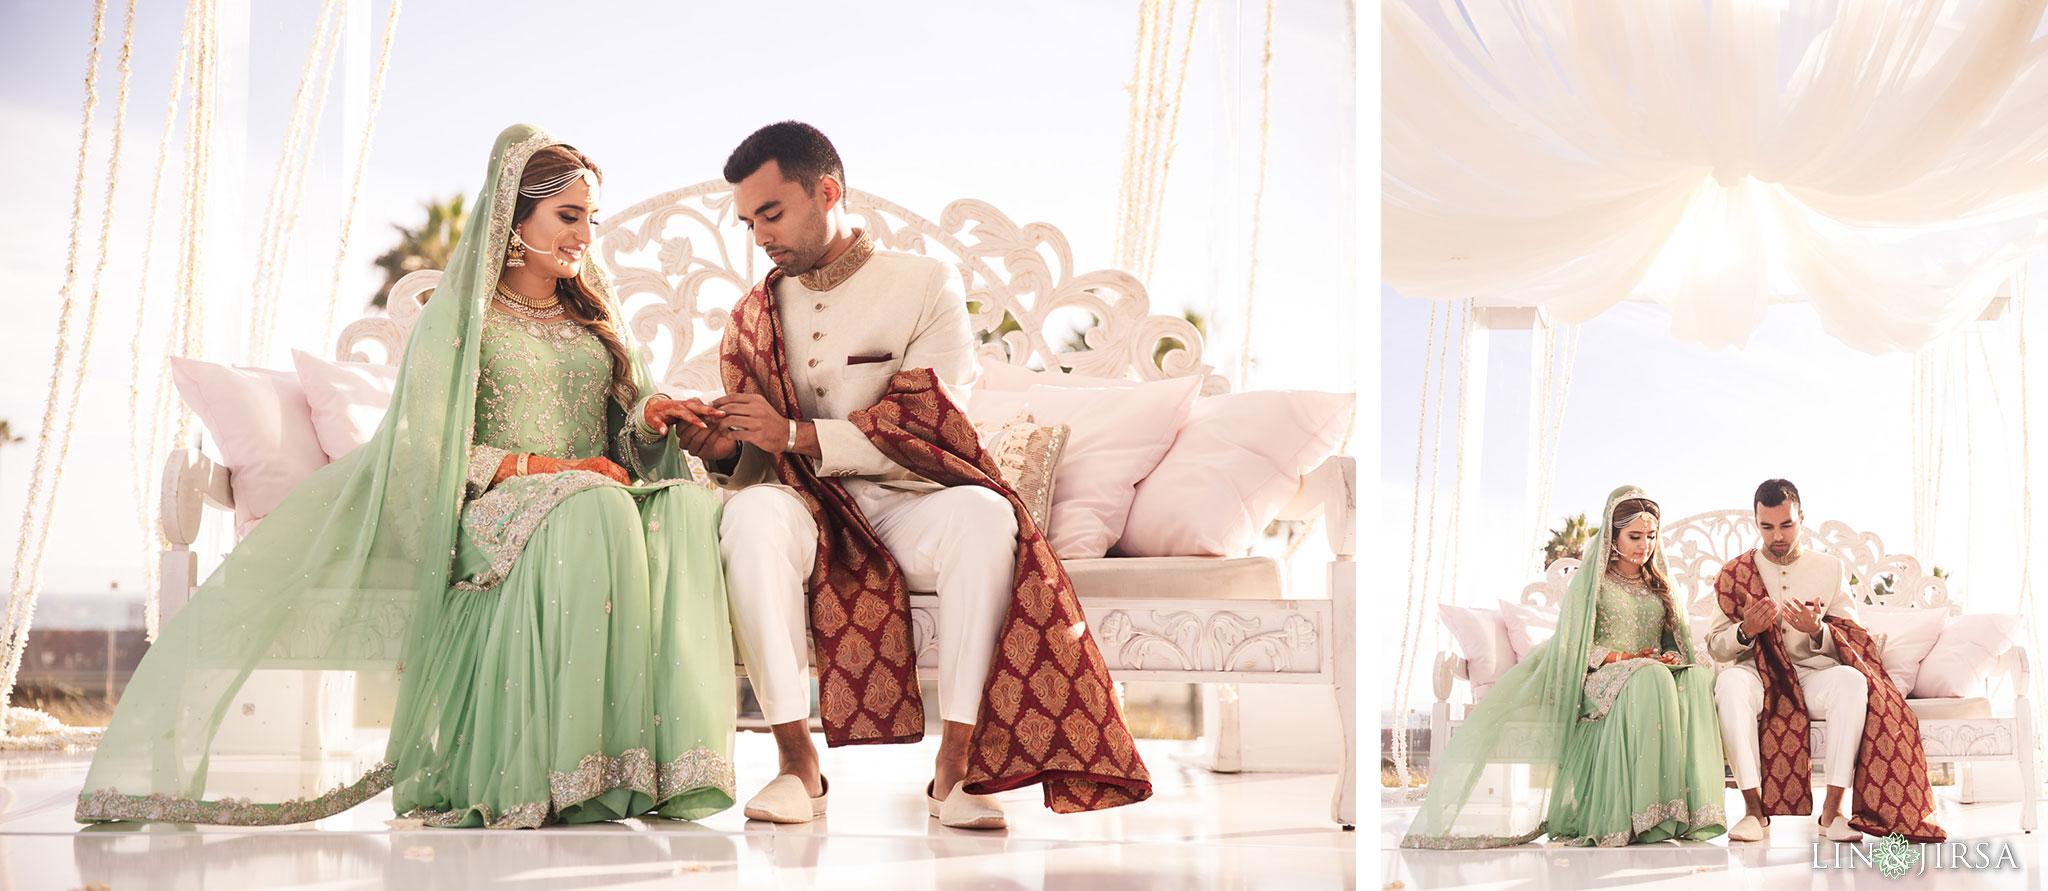 023 pasea hotel huntington beach pakistani wedding ceremony photography